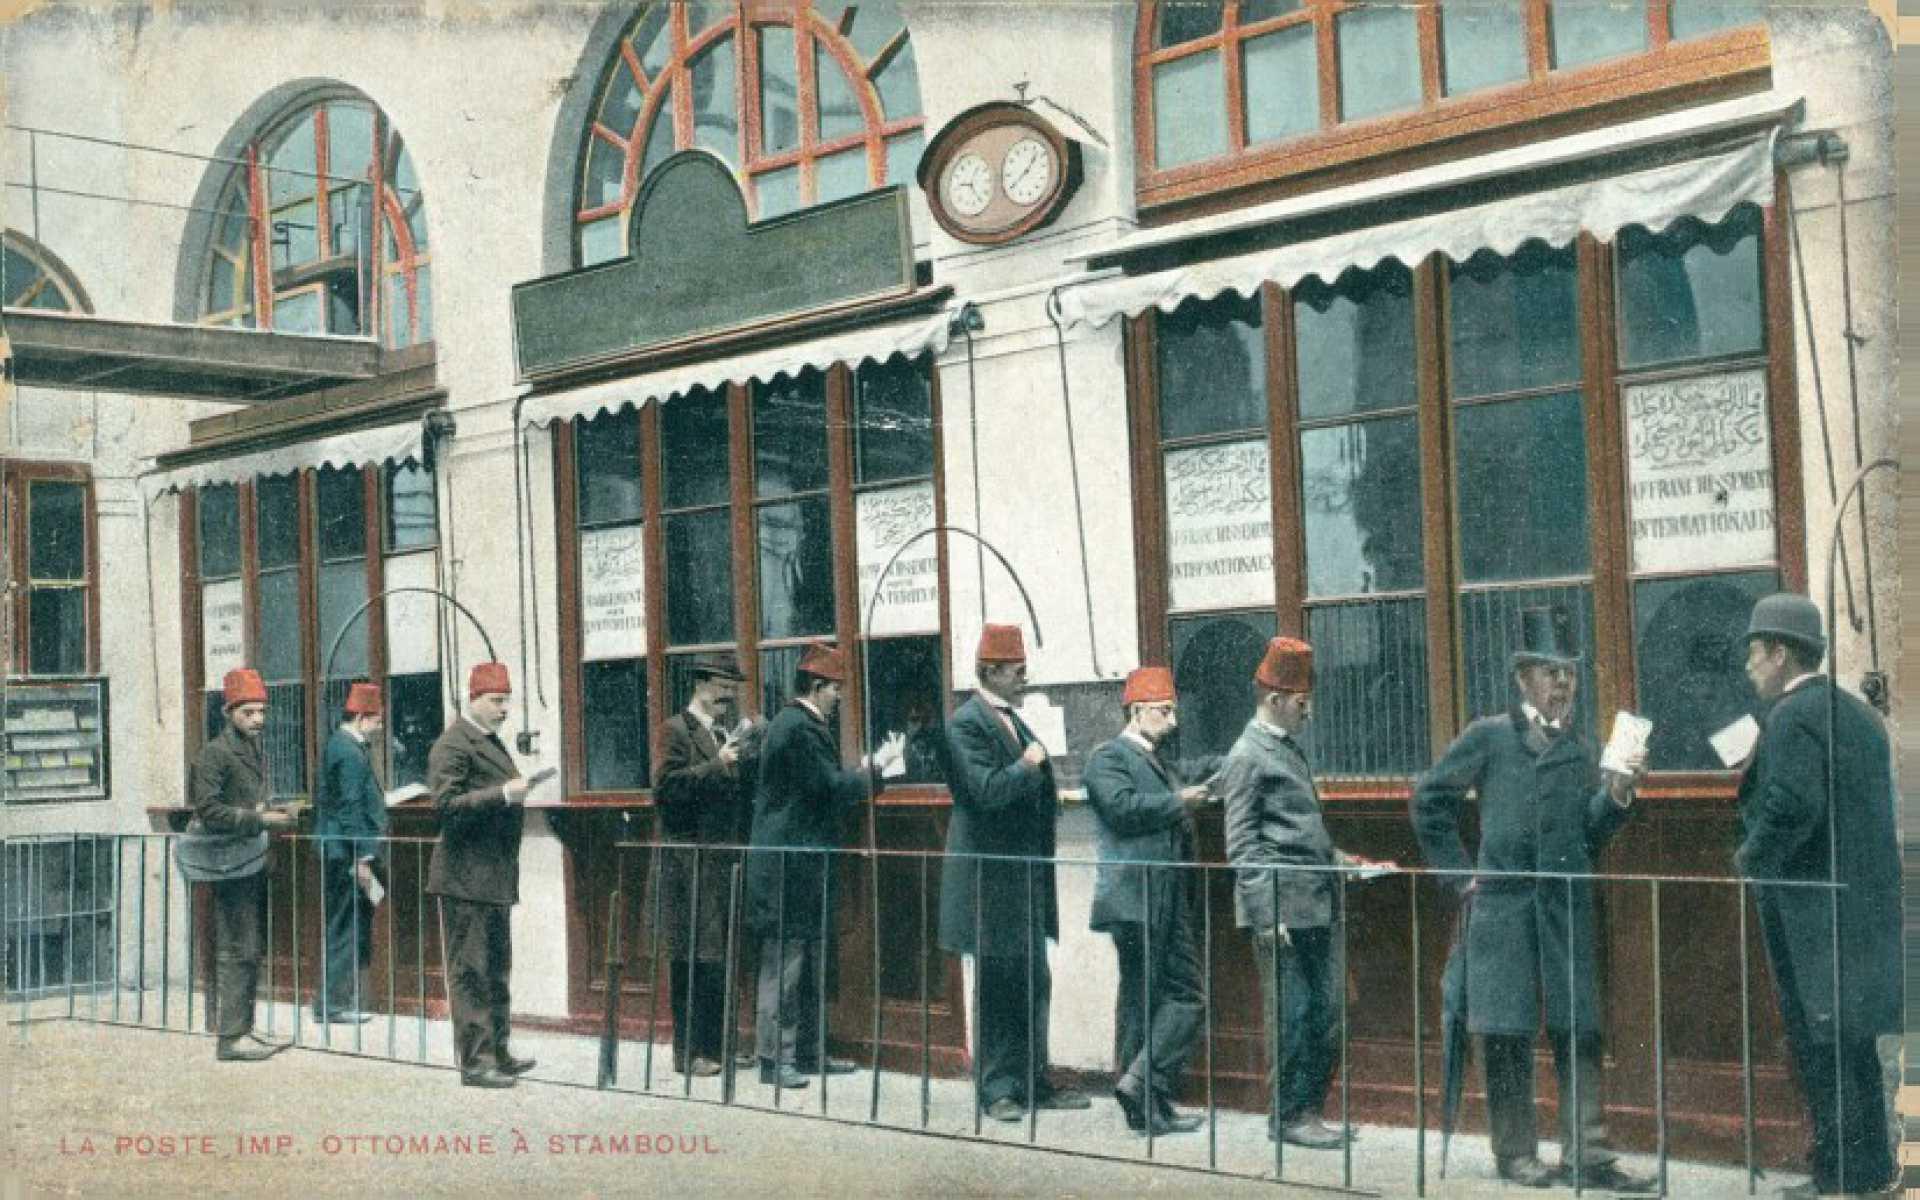 La poste Imp. Ottomane a Stamboul